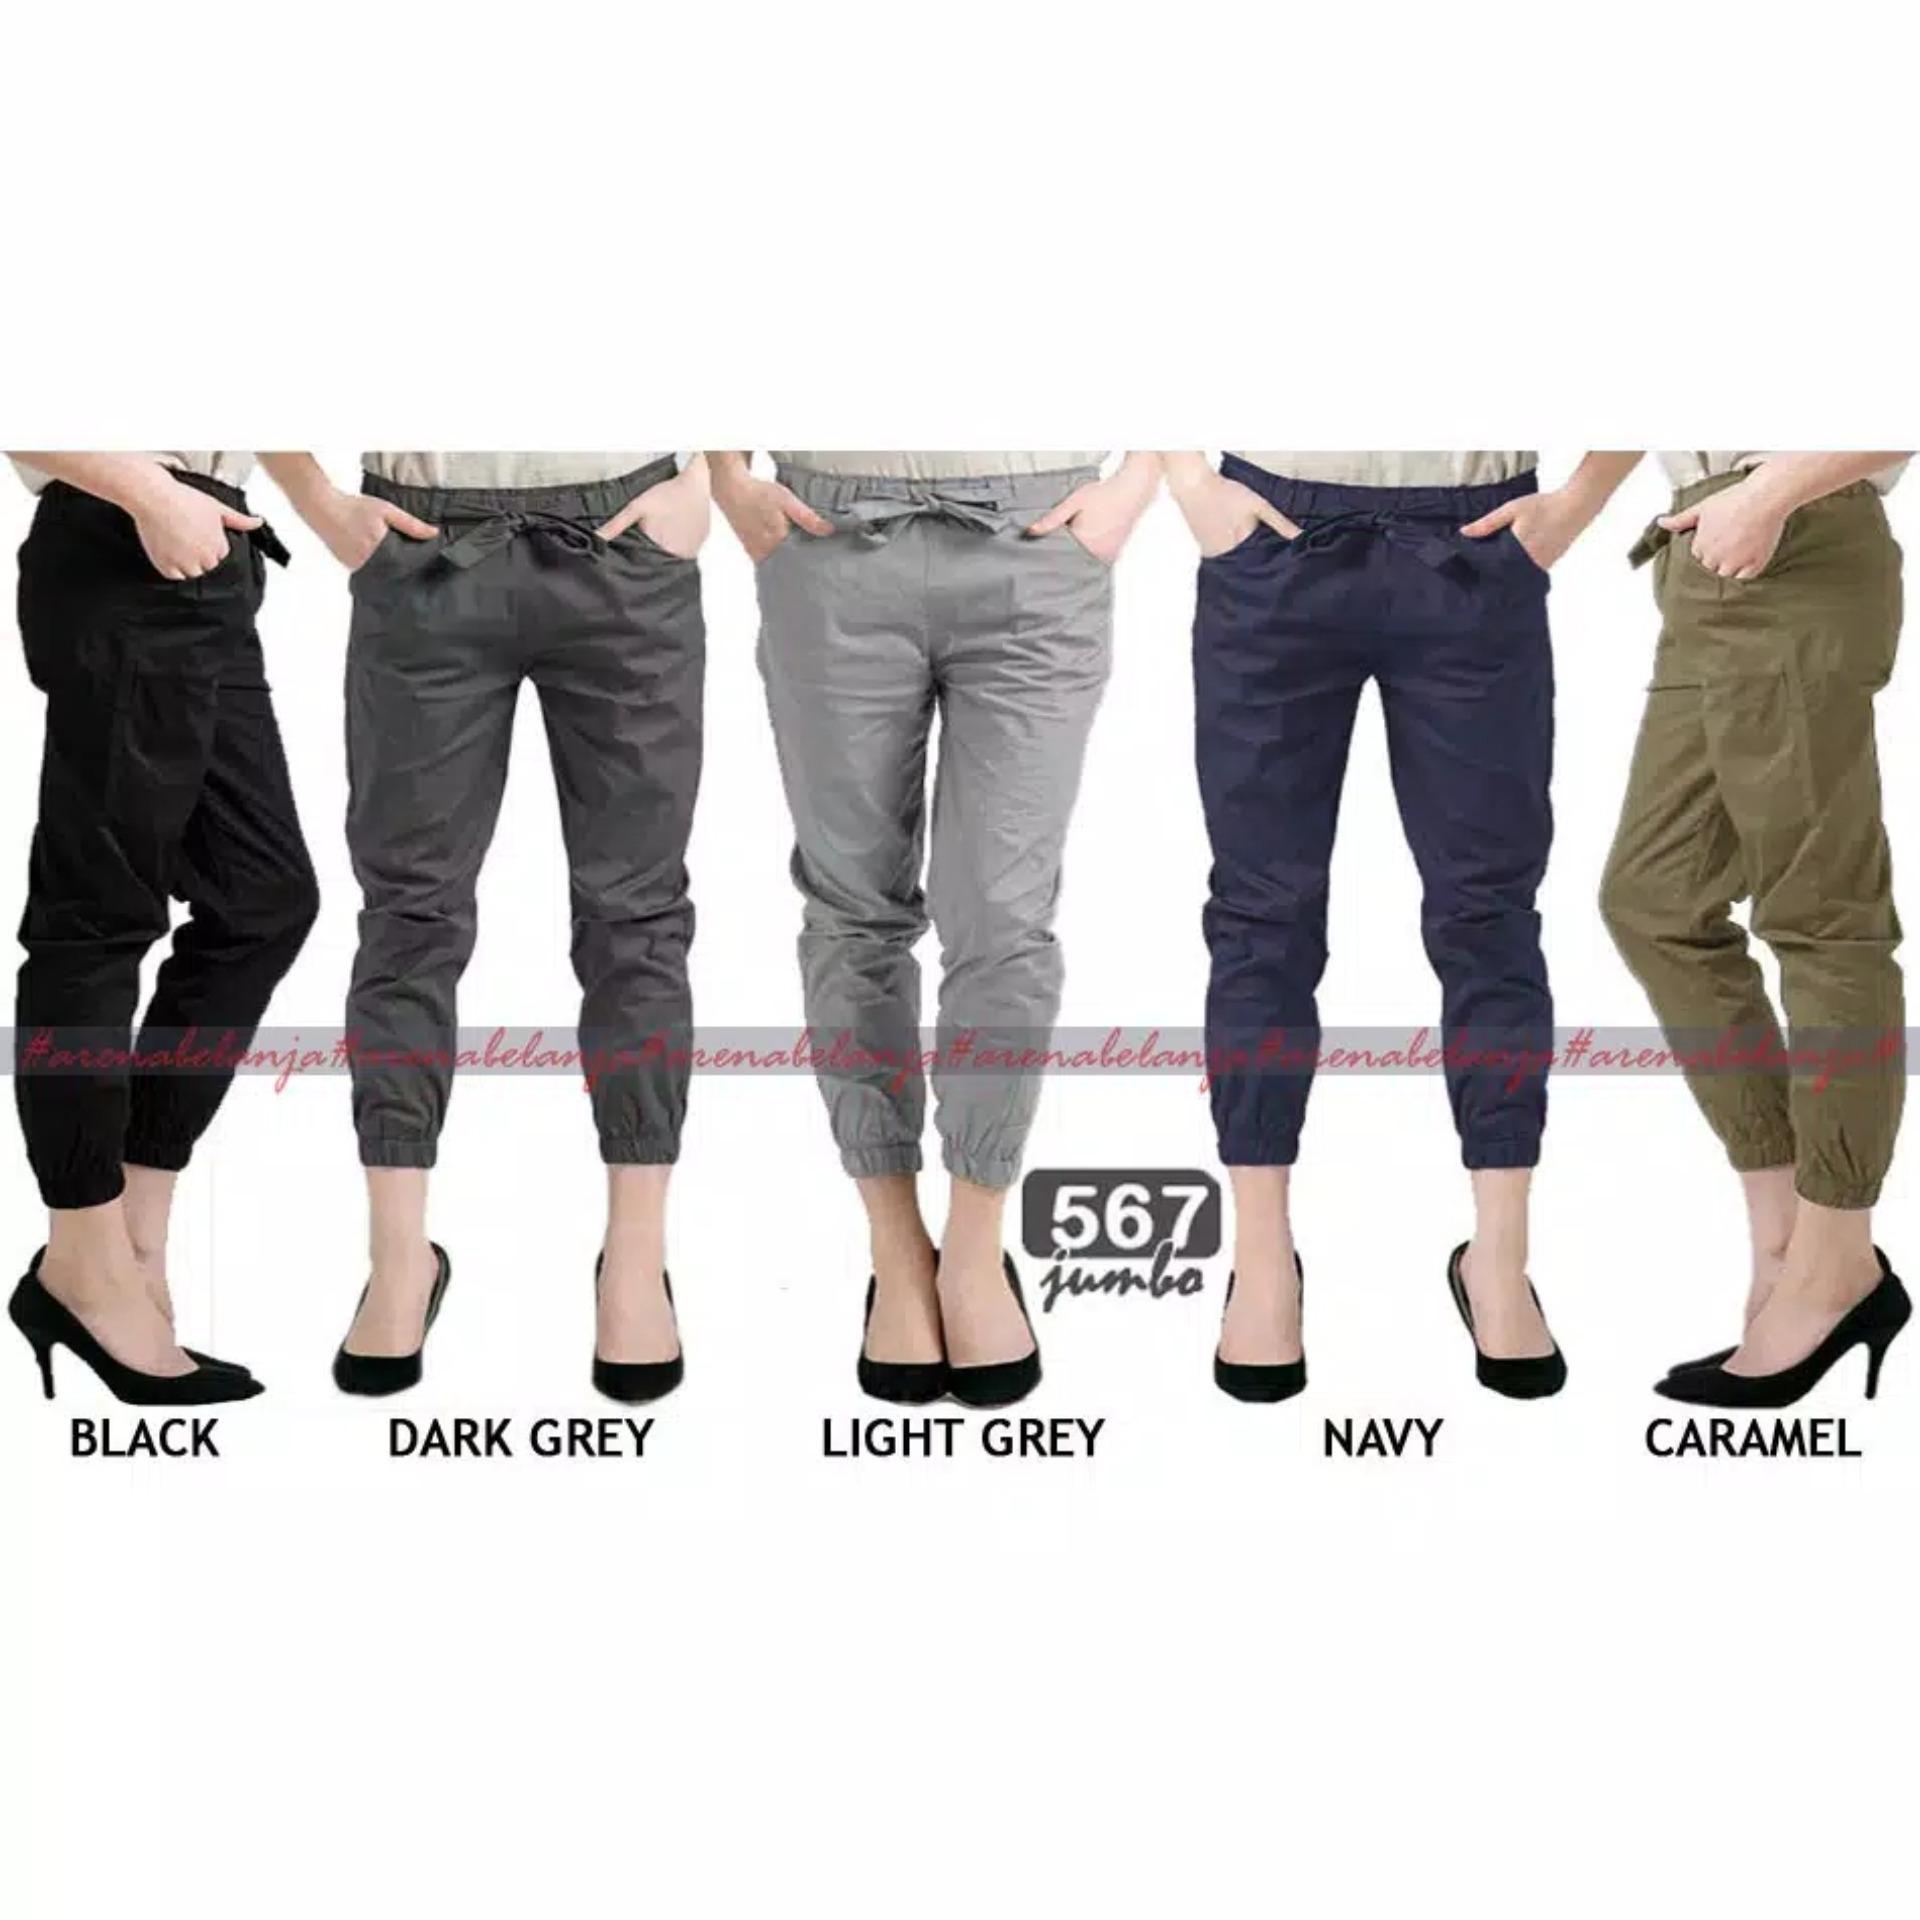 Buy Sell Cheapest Legging Panjang Polos Best Quality Product Deals Celana Wanita Ukuran All Size Fit To L Aneka Warna Djakarta Mall Lejing